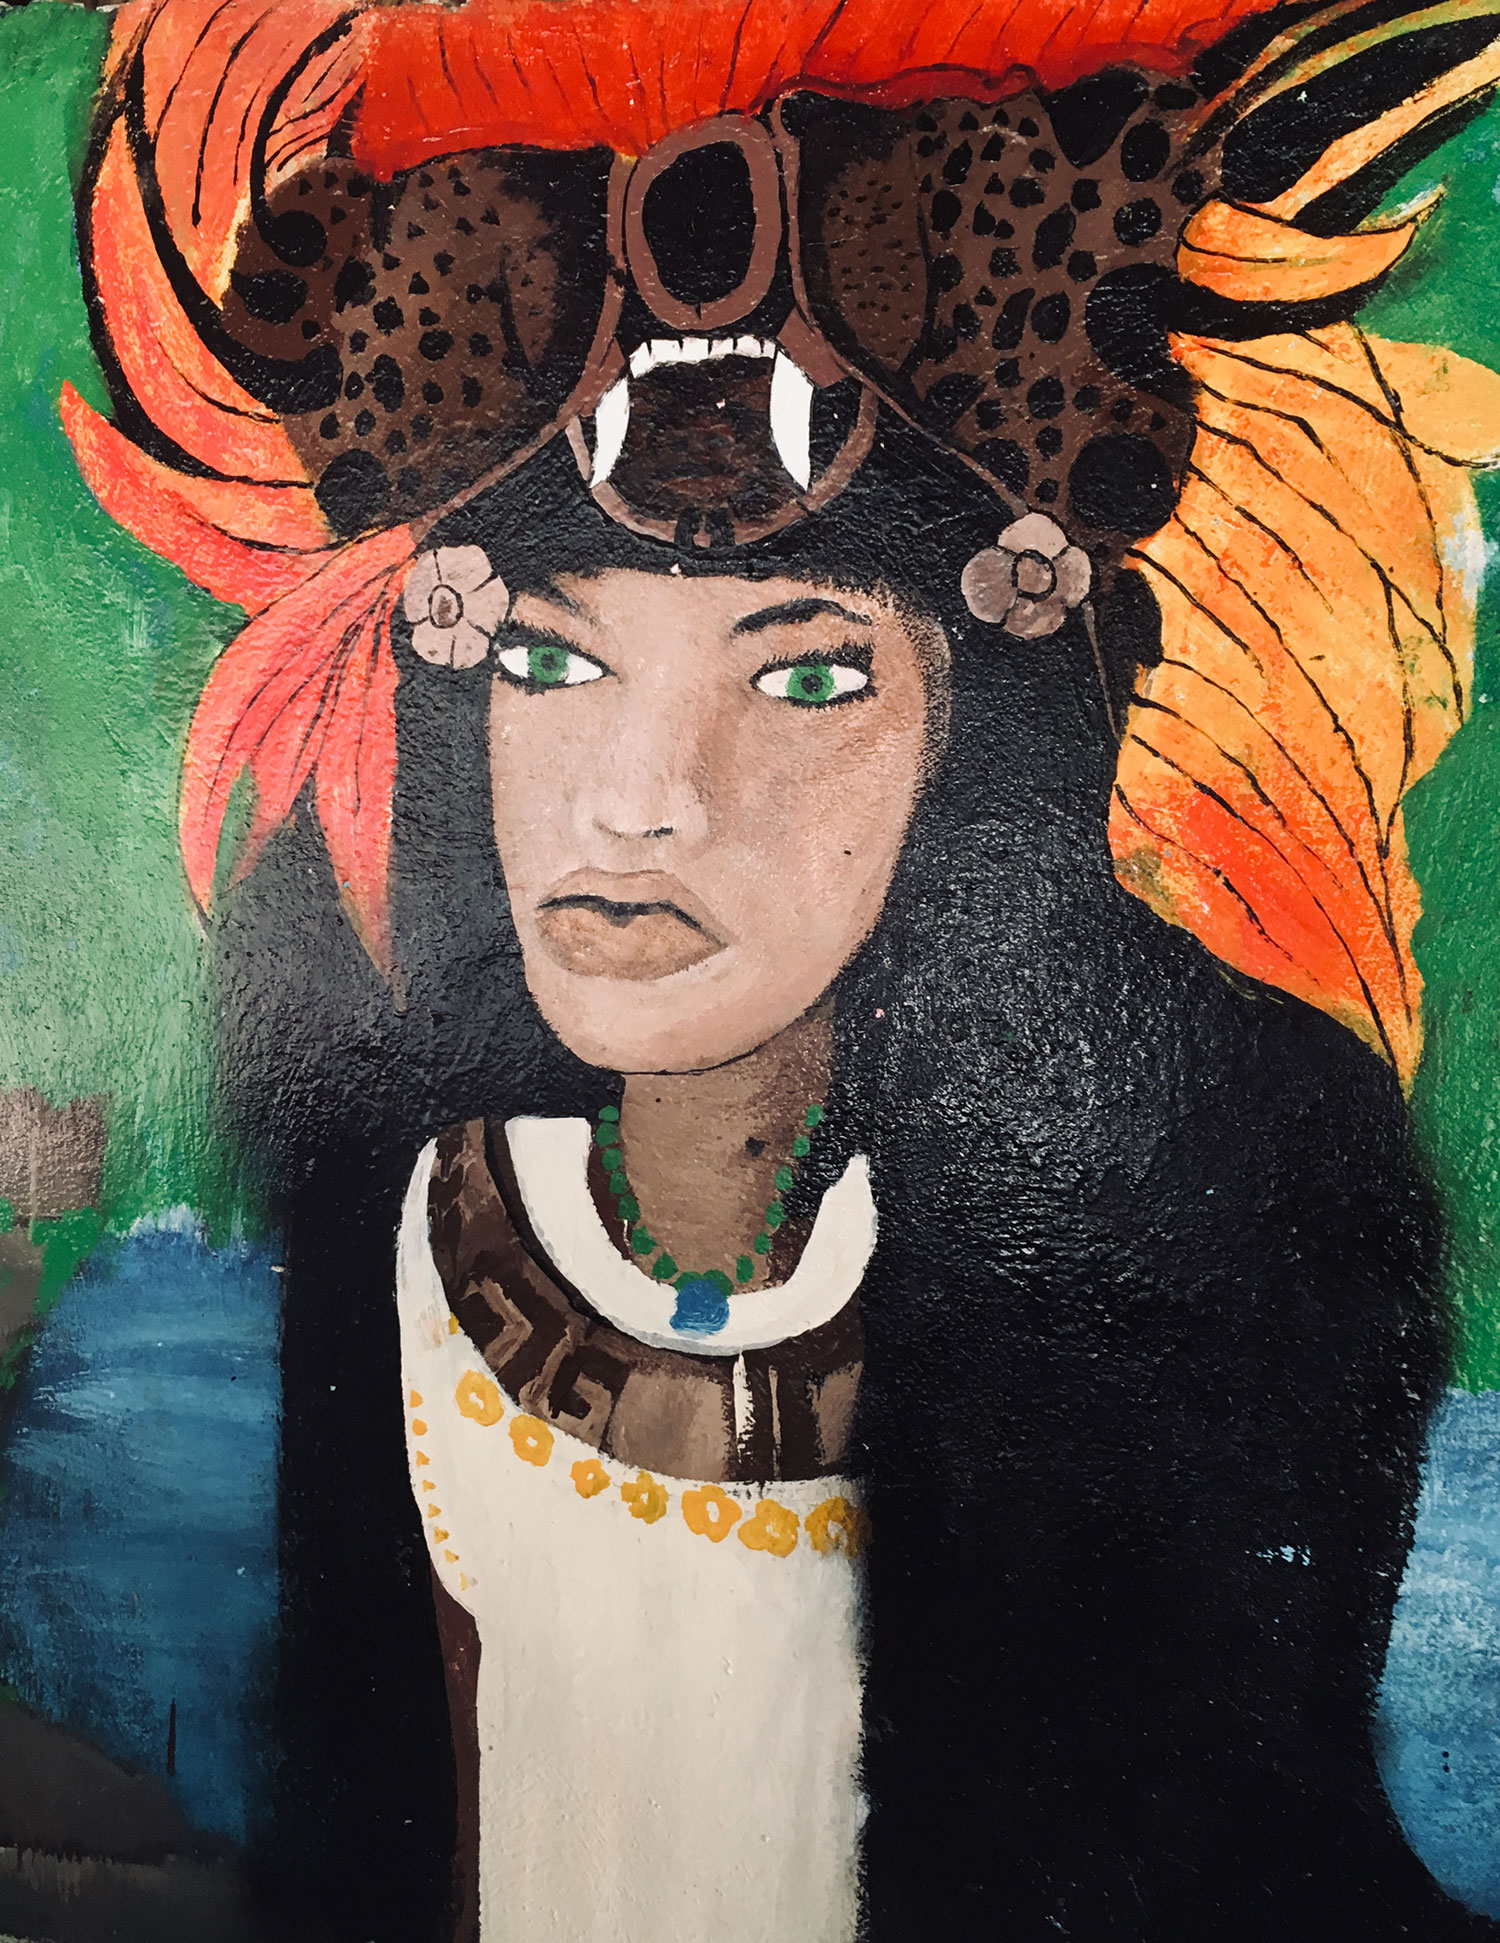 Hammocks_and_Ruins_What_to_Do_Mexico_Maya_cenote_7_bocas_37.jpg